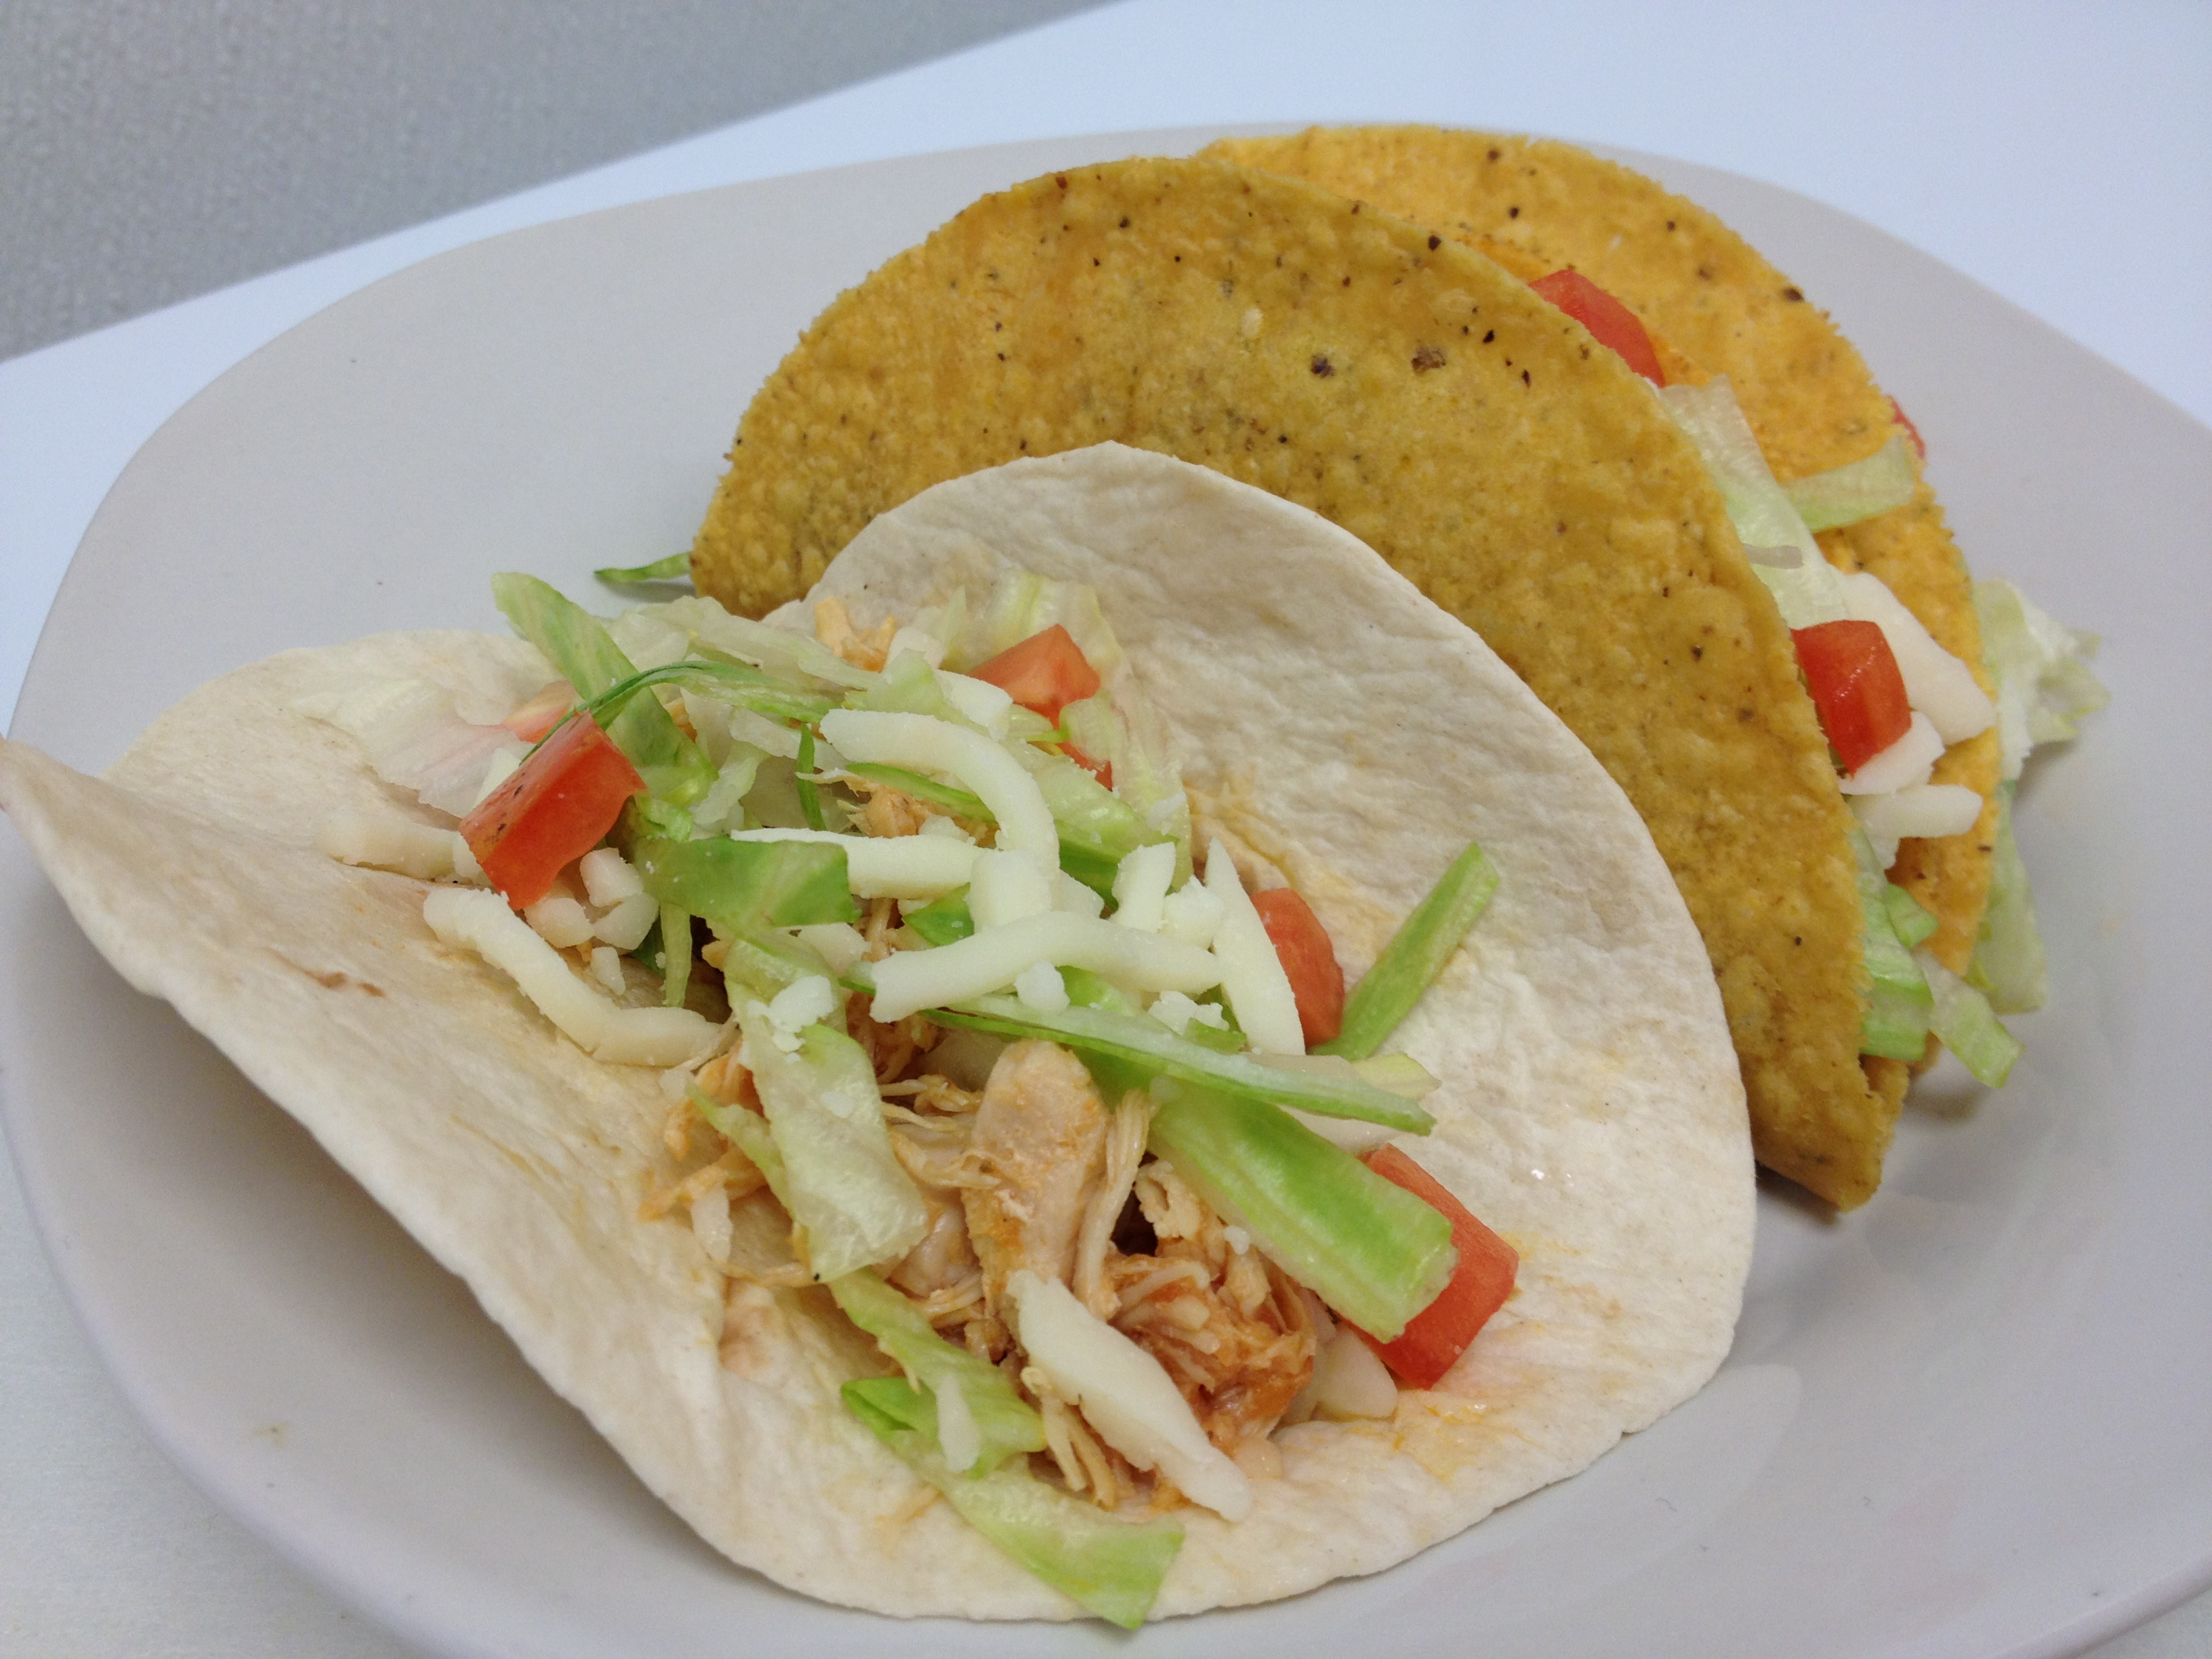 Tacos Order (2) Soft Or Hard Tortilla Image